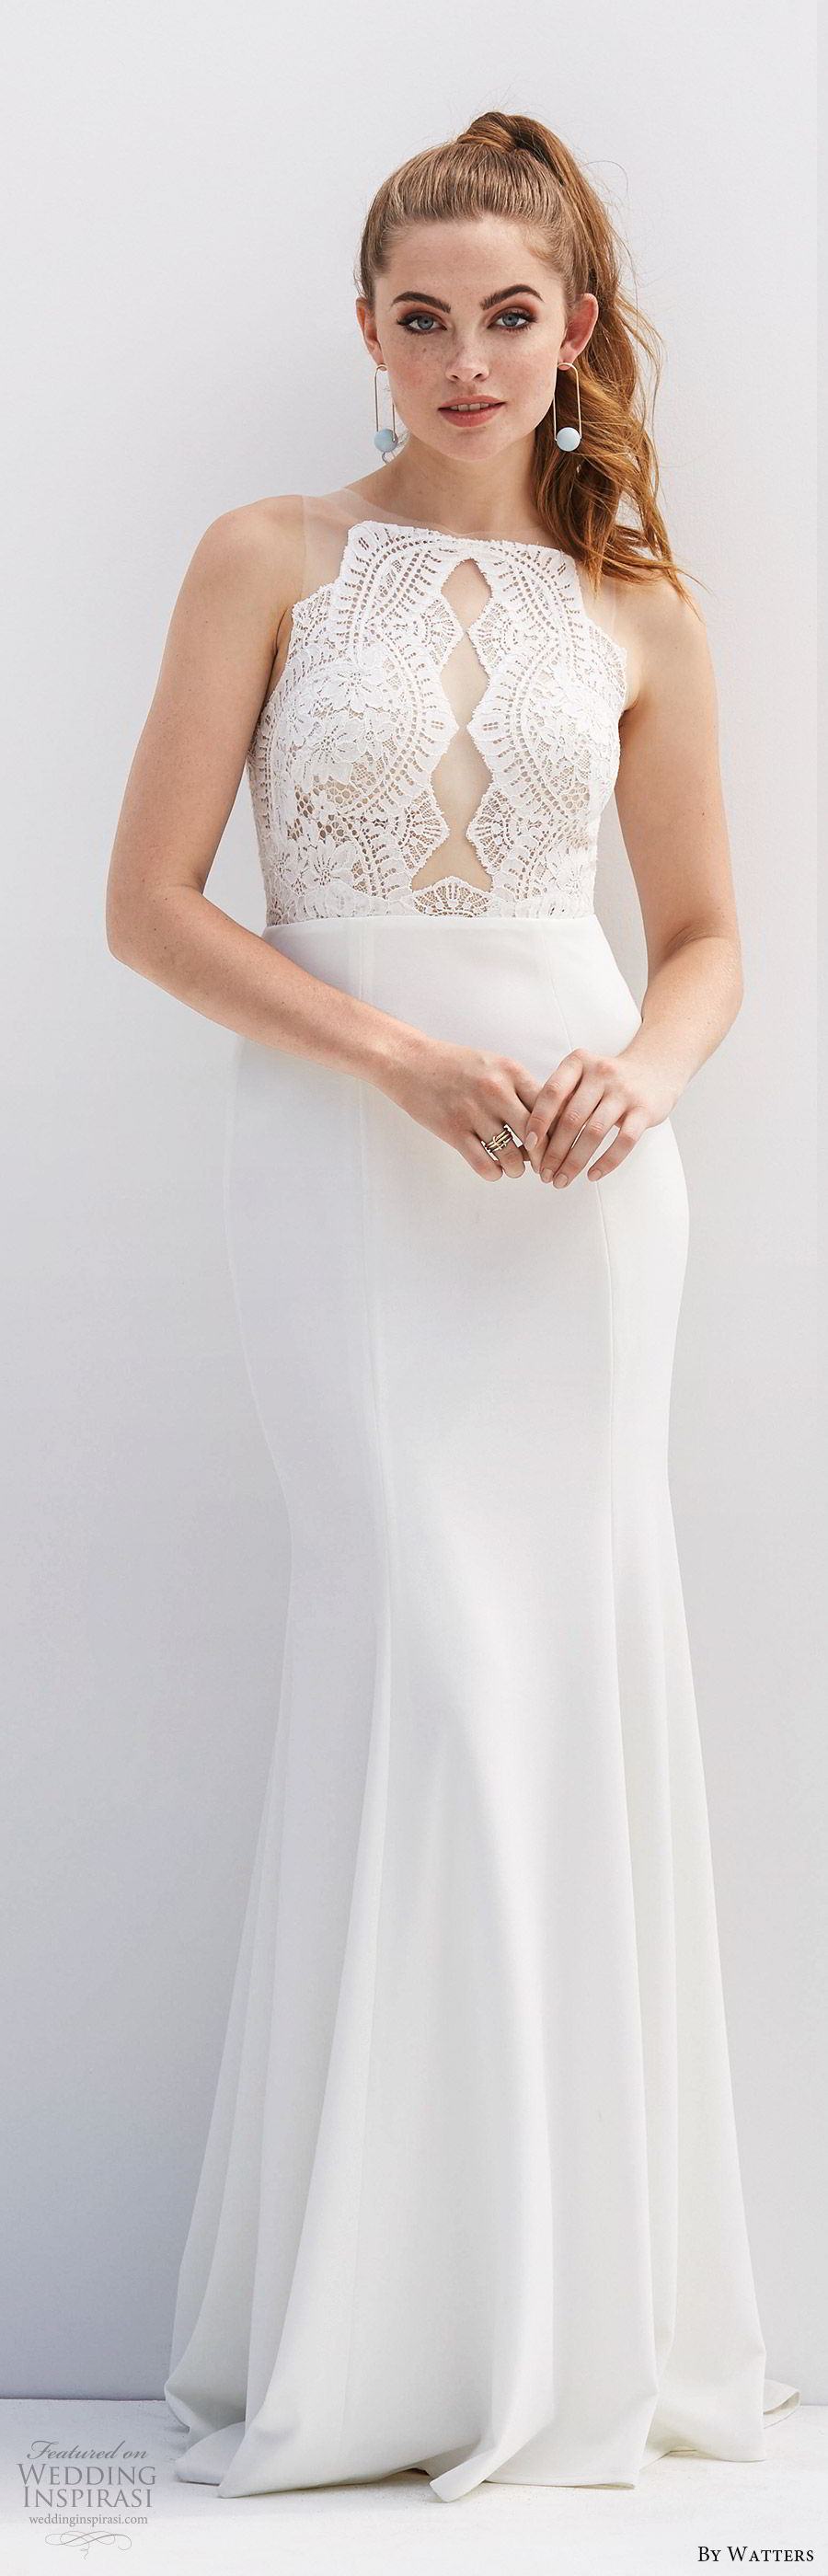 by watters 2020 bridal sleeveless illusion jewel neck sheer lace bodice fit flare sheath trumpet wedding dress (8) clean modern chic mv